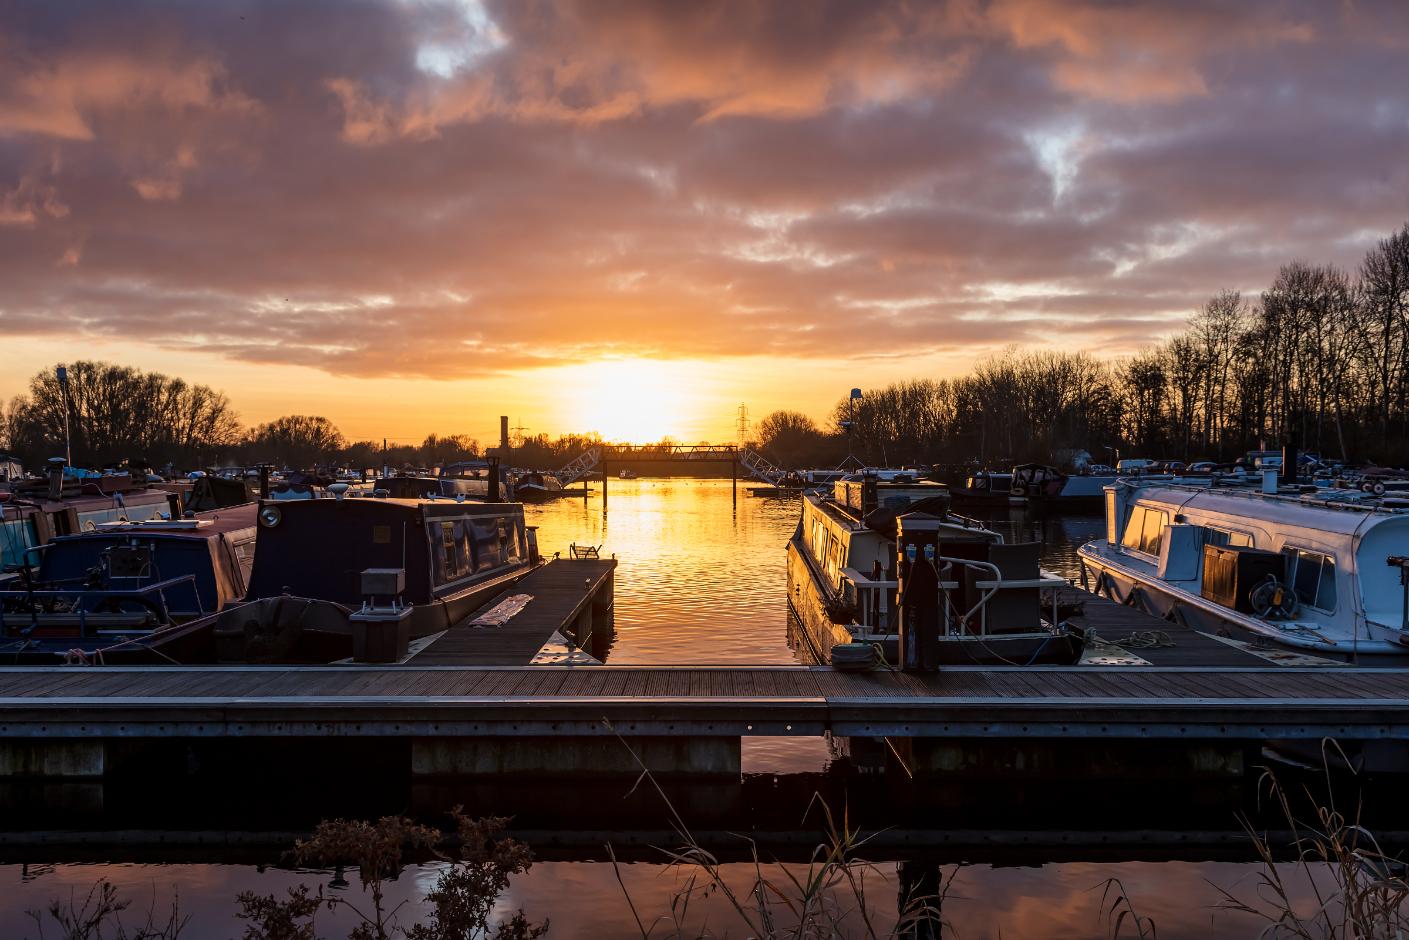 RMV Marina Sunset 1